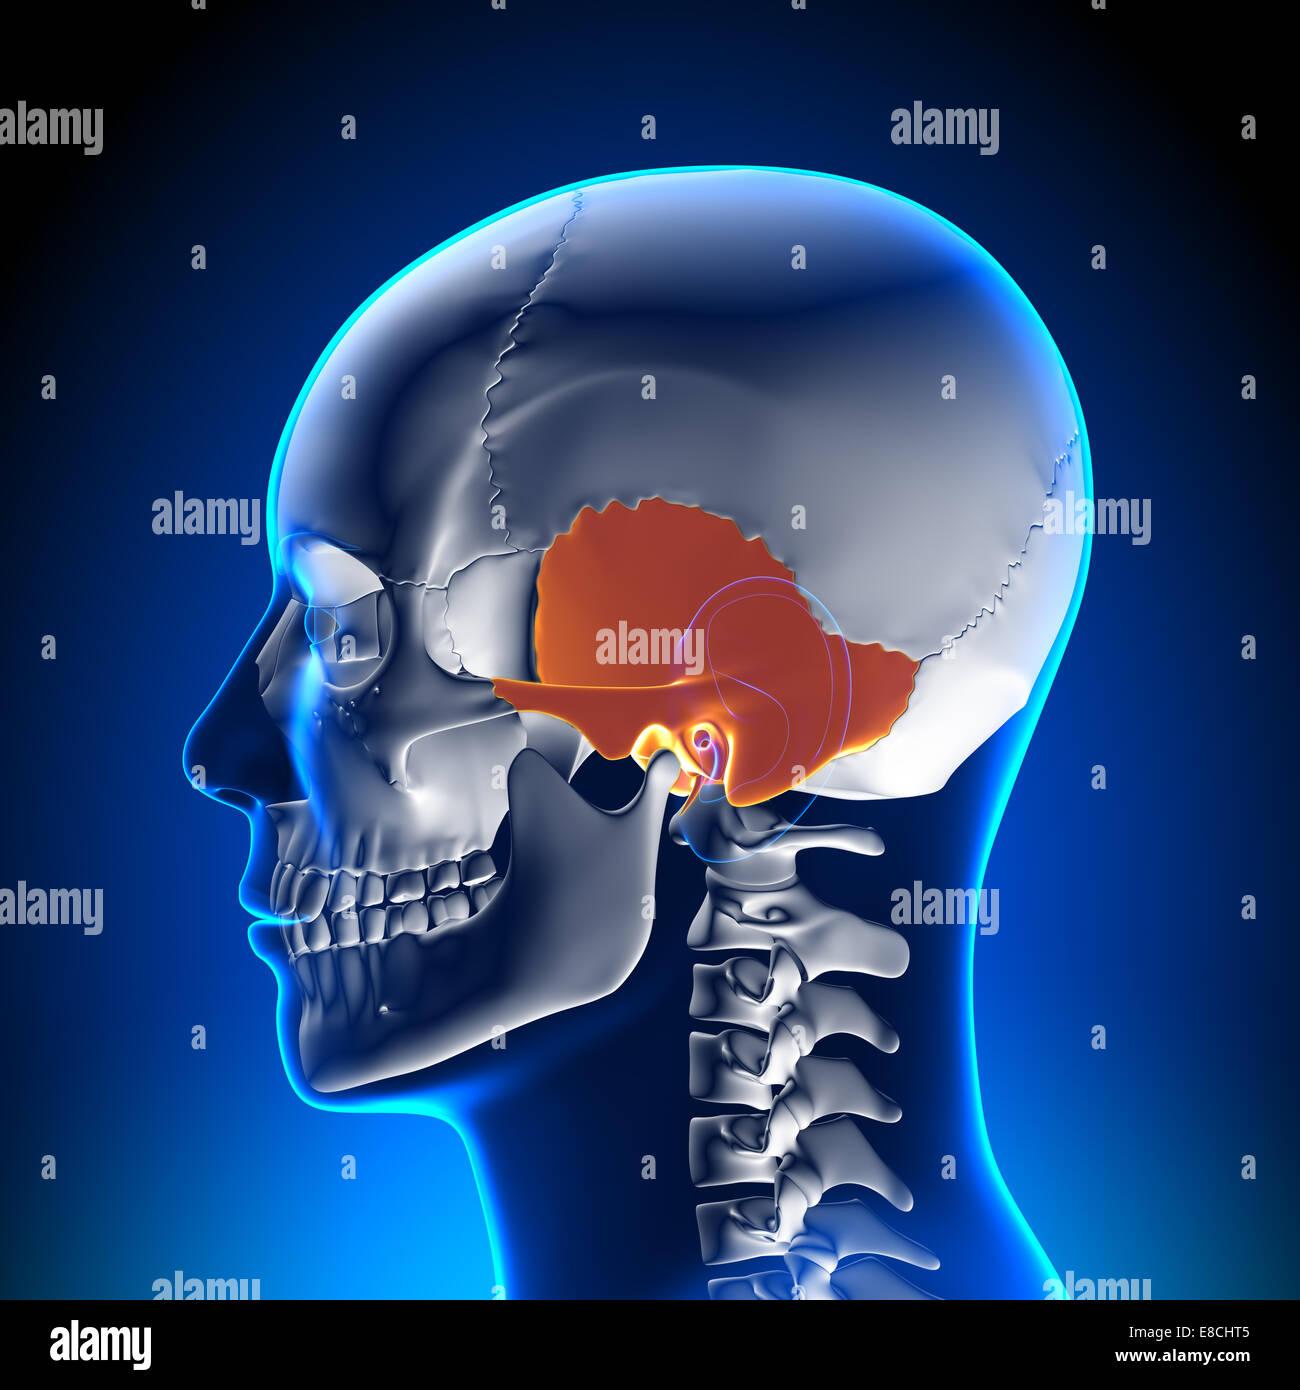 Temporal Bone Stock Photos & Temporal Bone Stock Images - Alamy